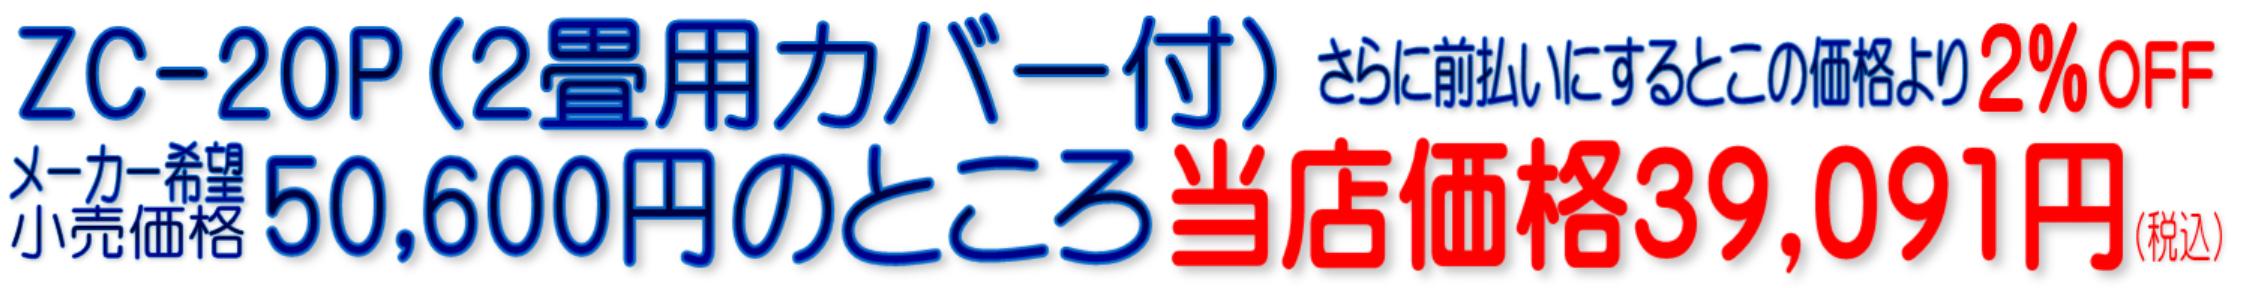 ZC-20P(2畳用カバー付)